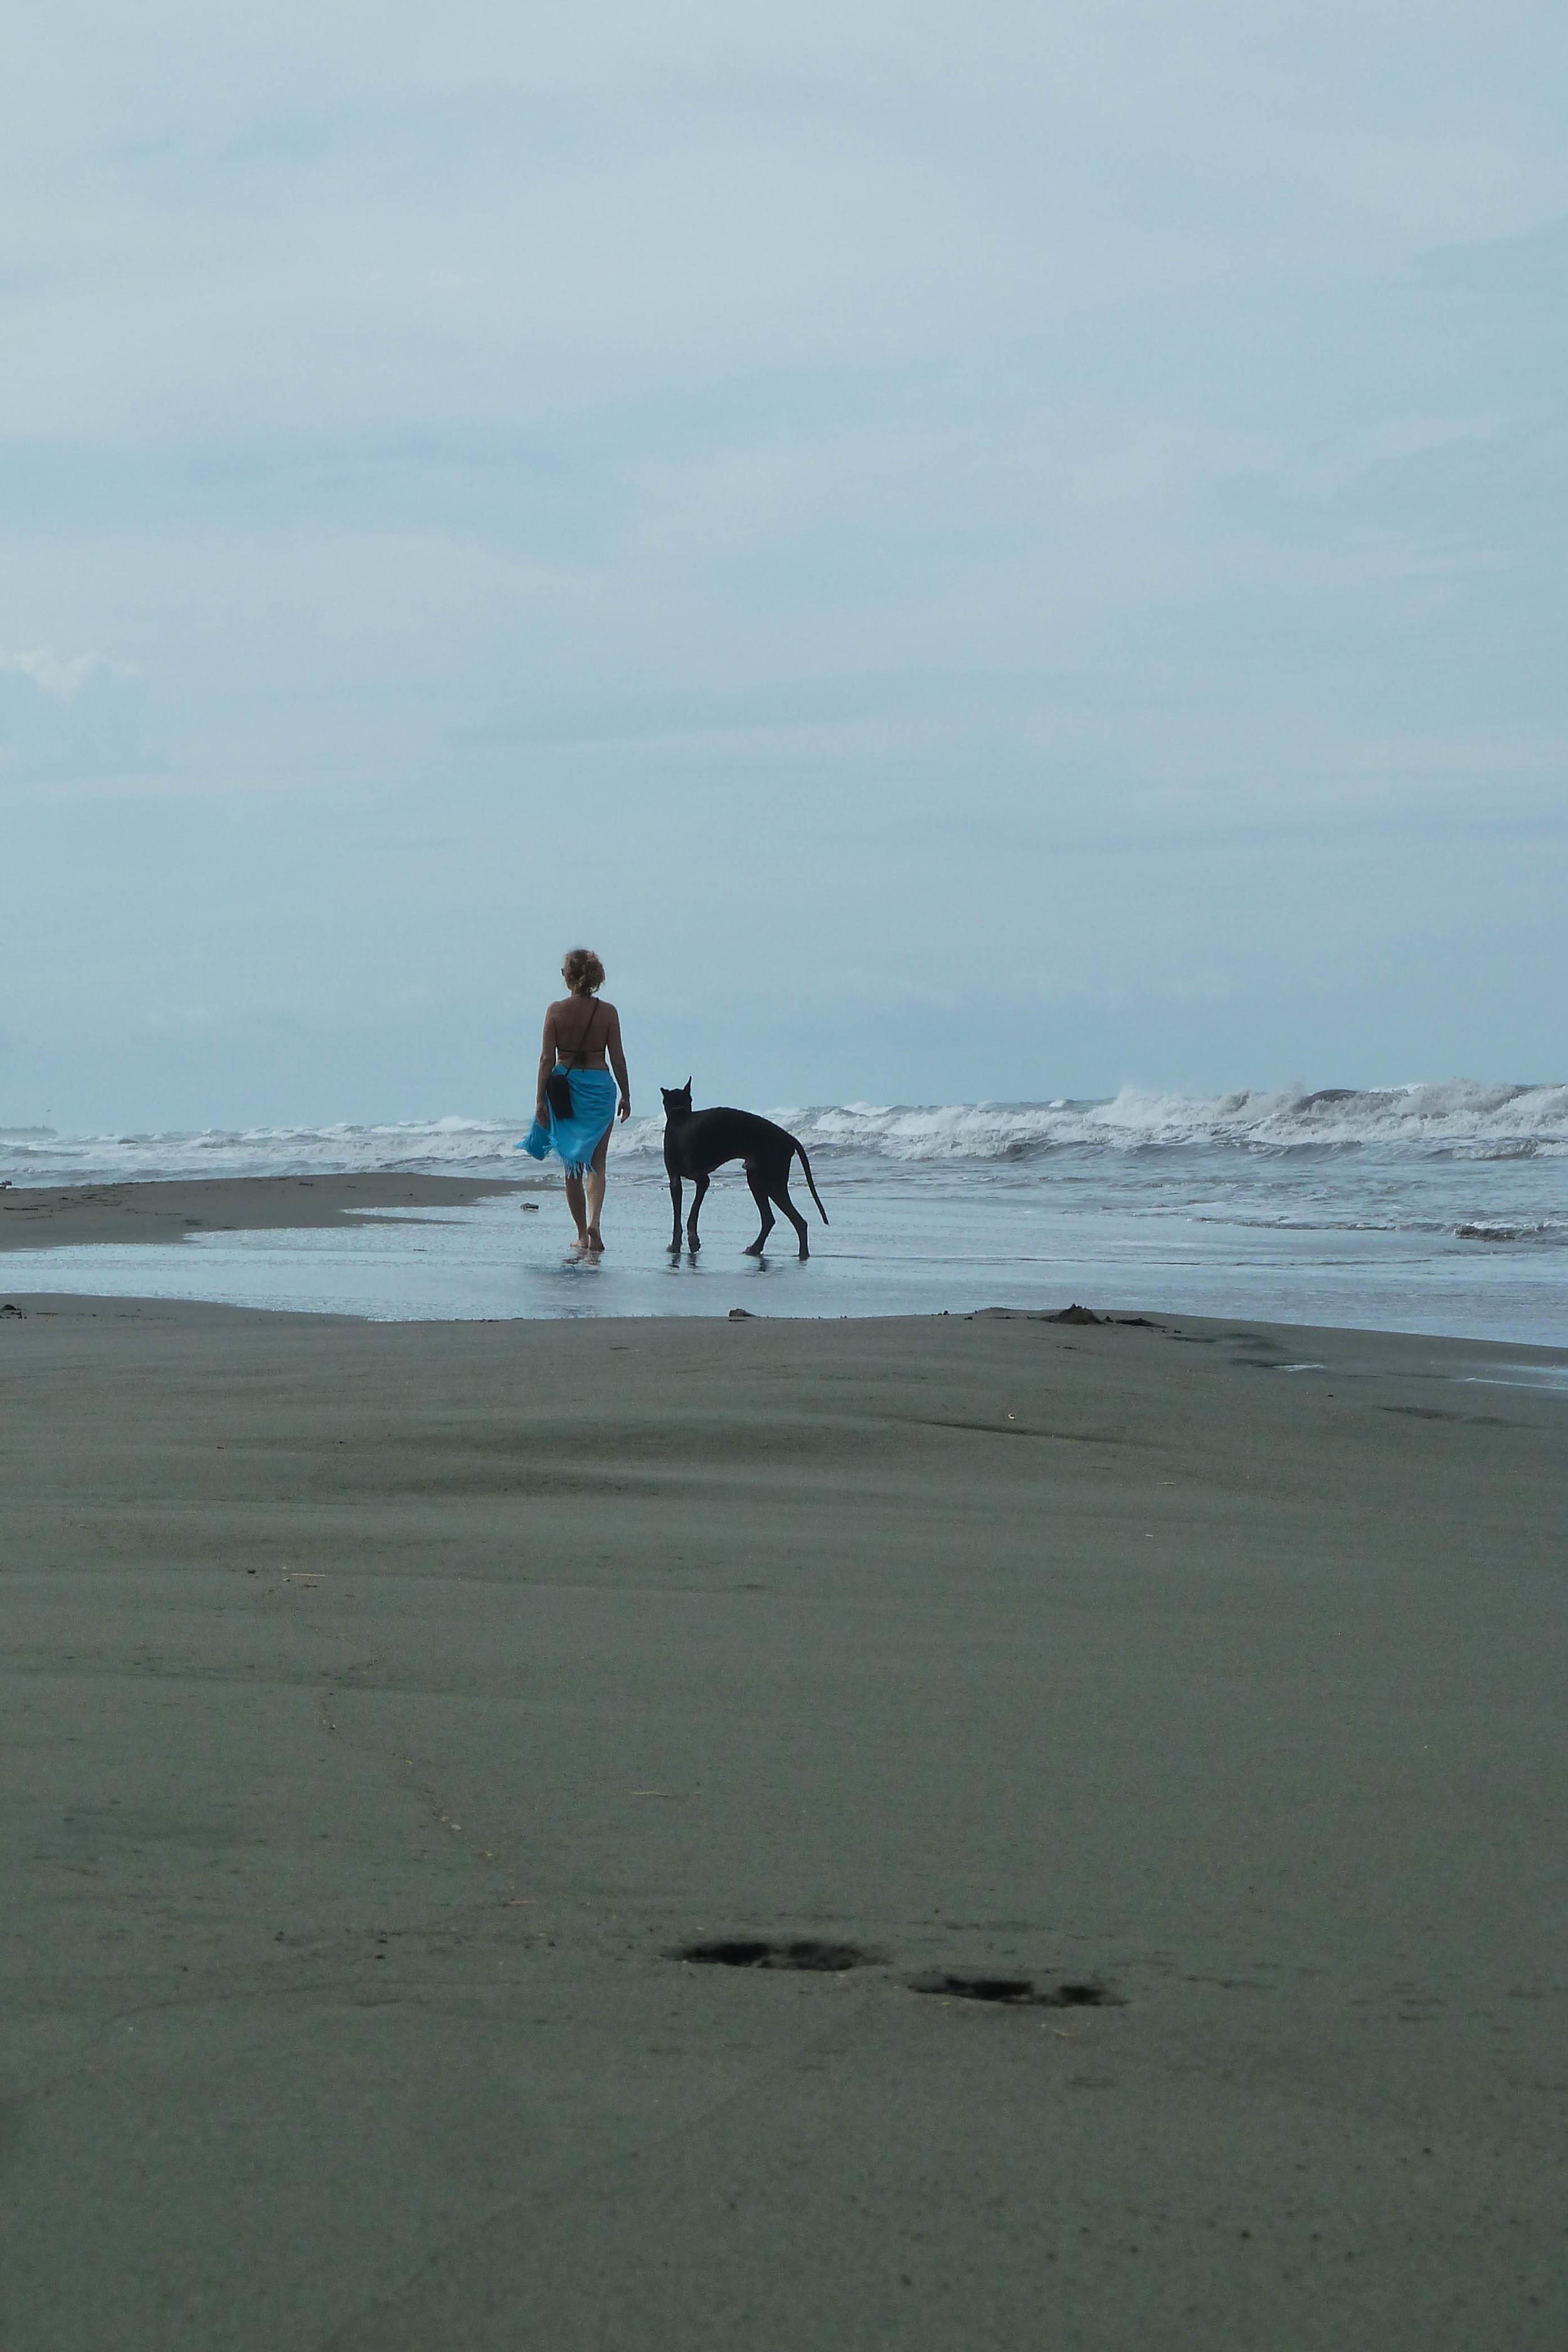 Giant Schnauzer on beach in Costa Rica